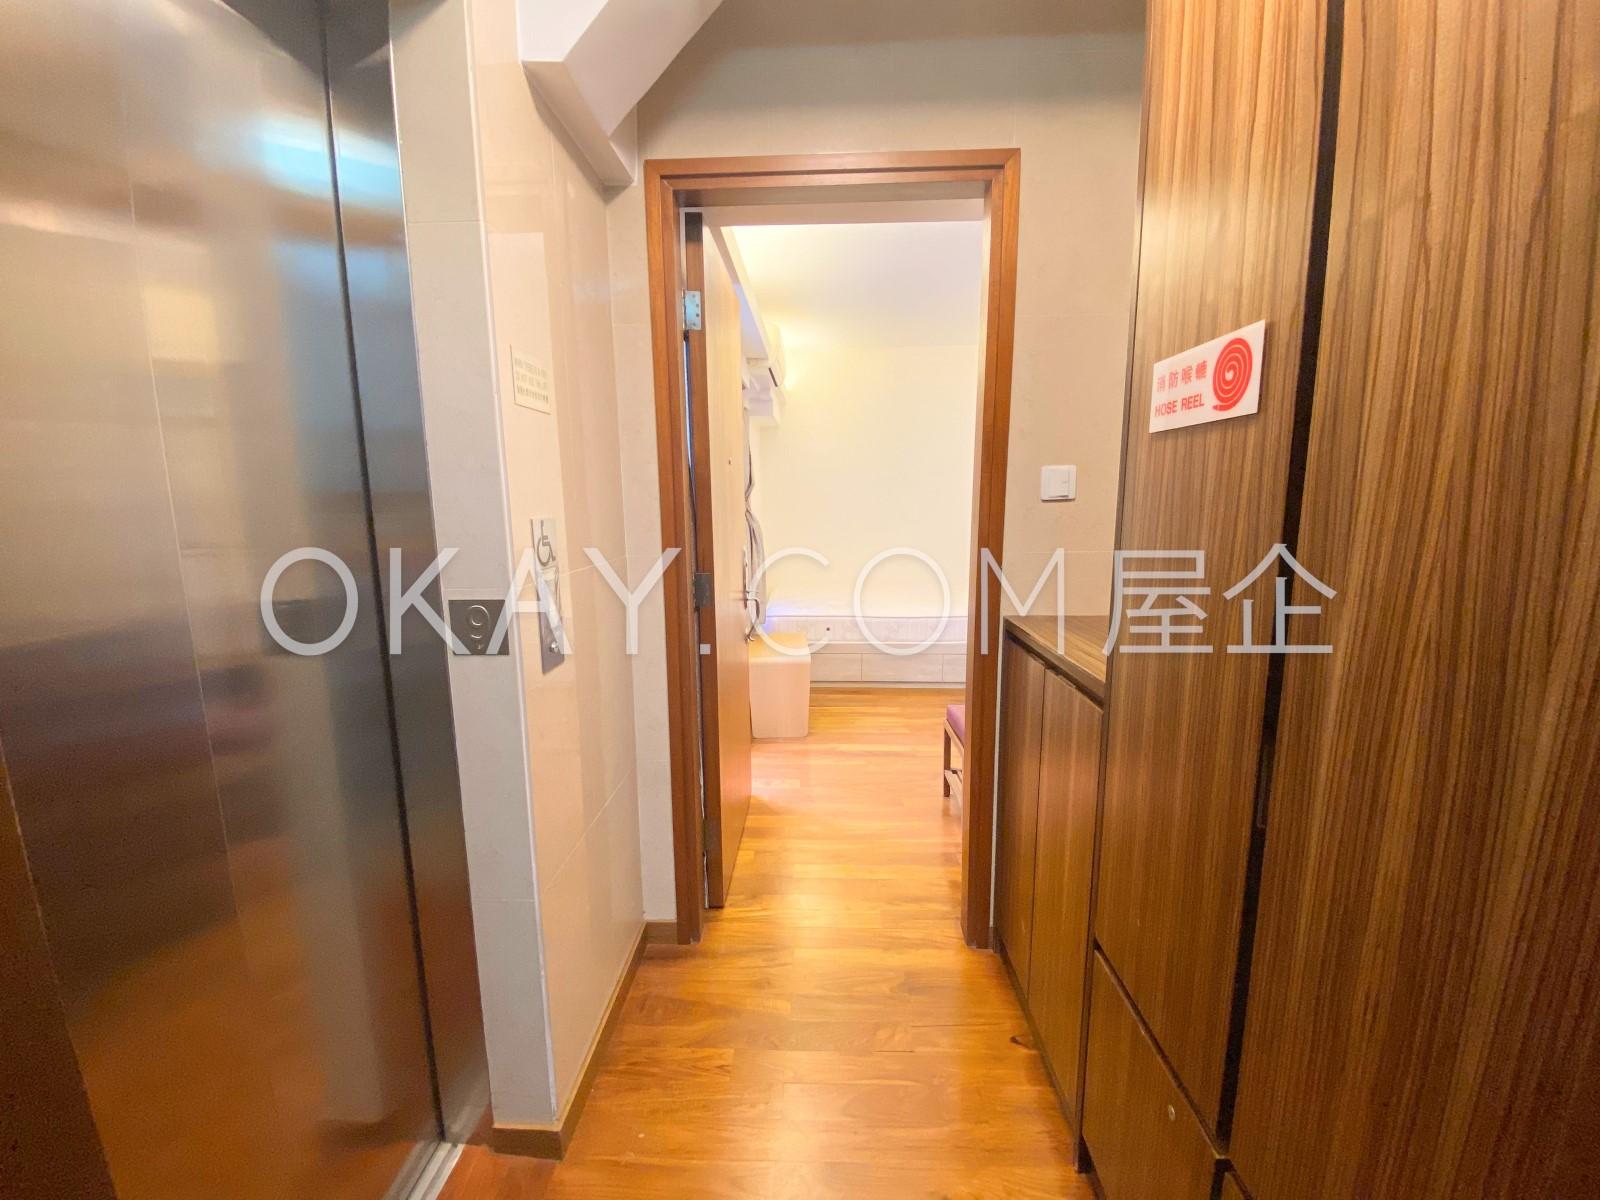 one unit per floor with massive storage